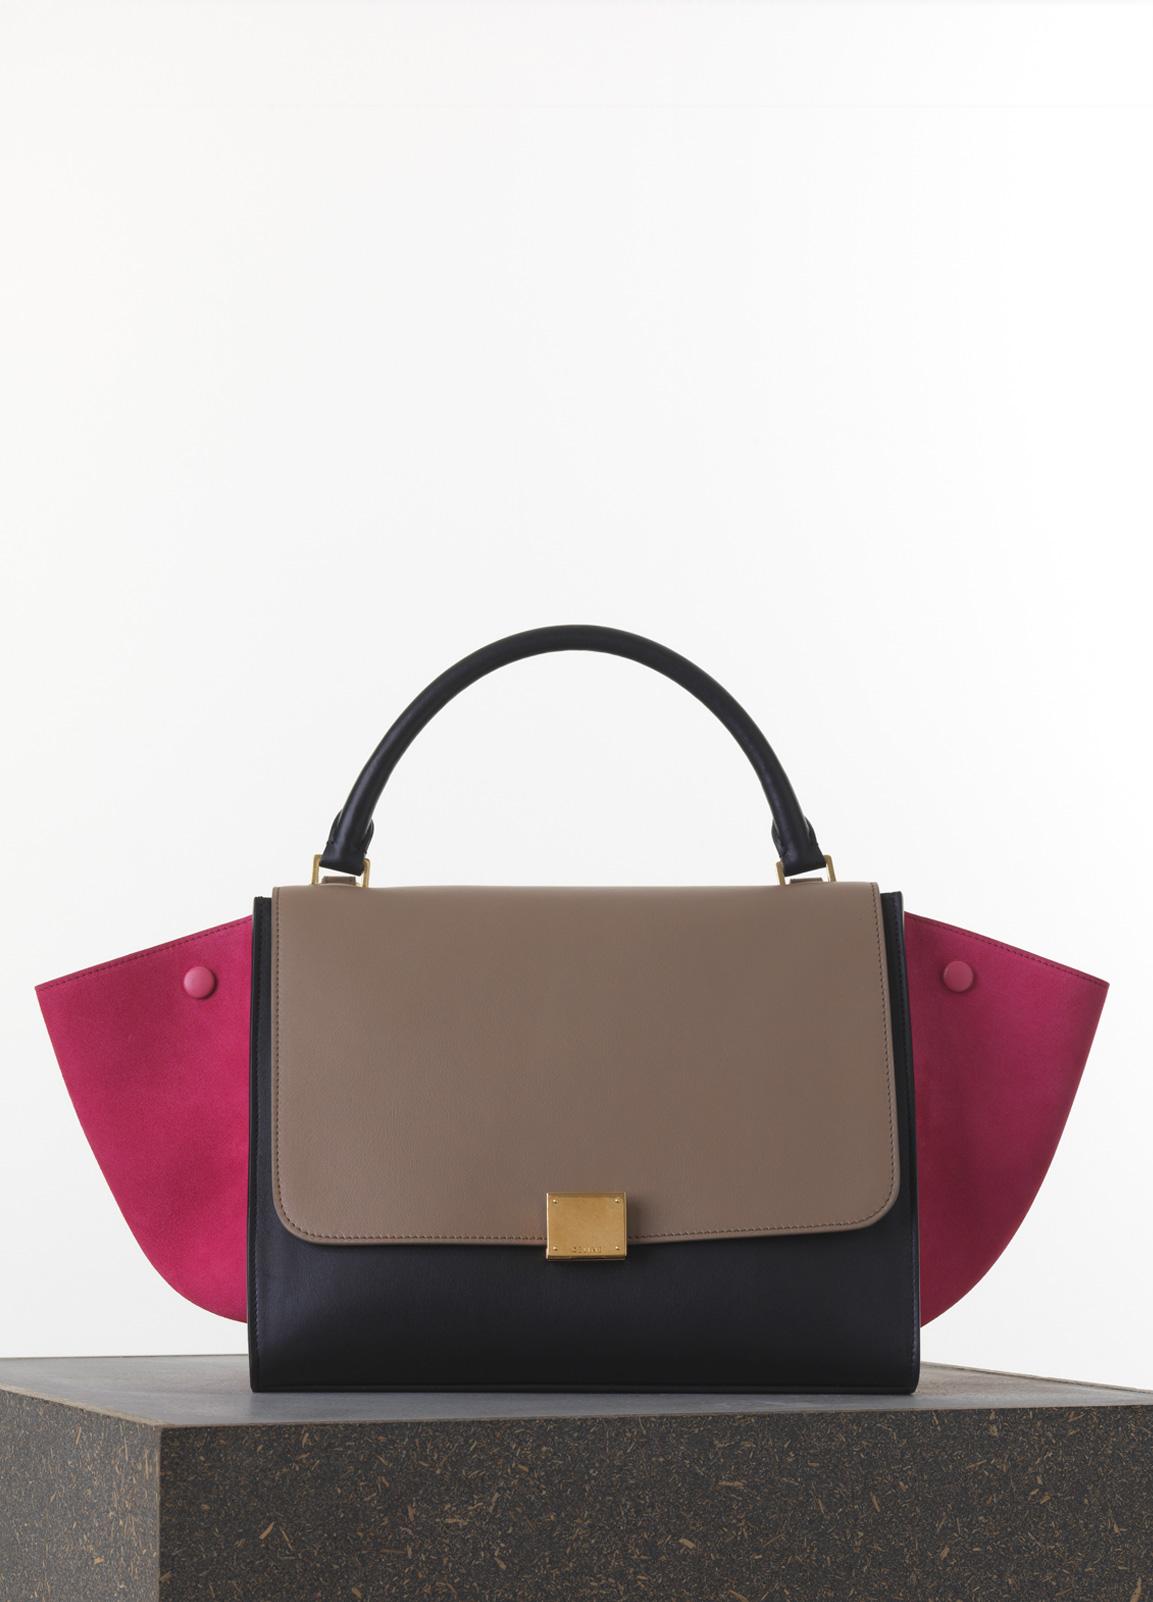 Celine-PinkTaupeBlack-Smooth-Calfskin-Trapeze-Medium-Bag